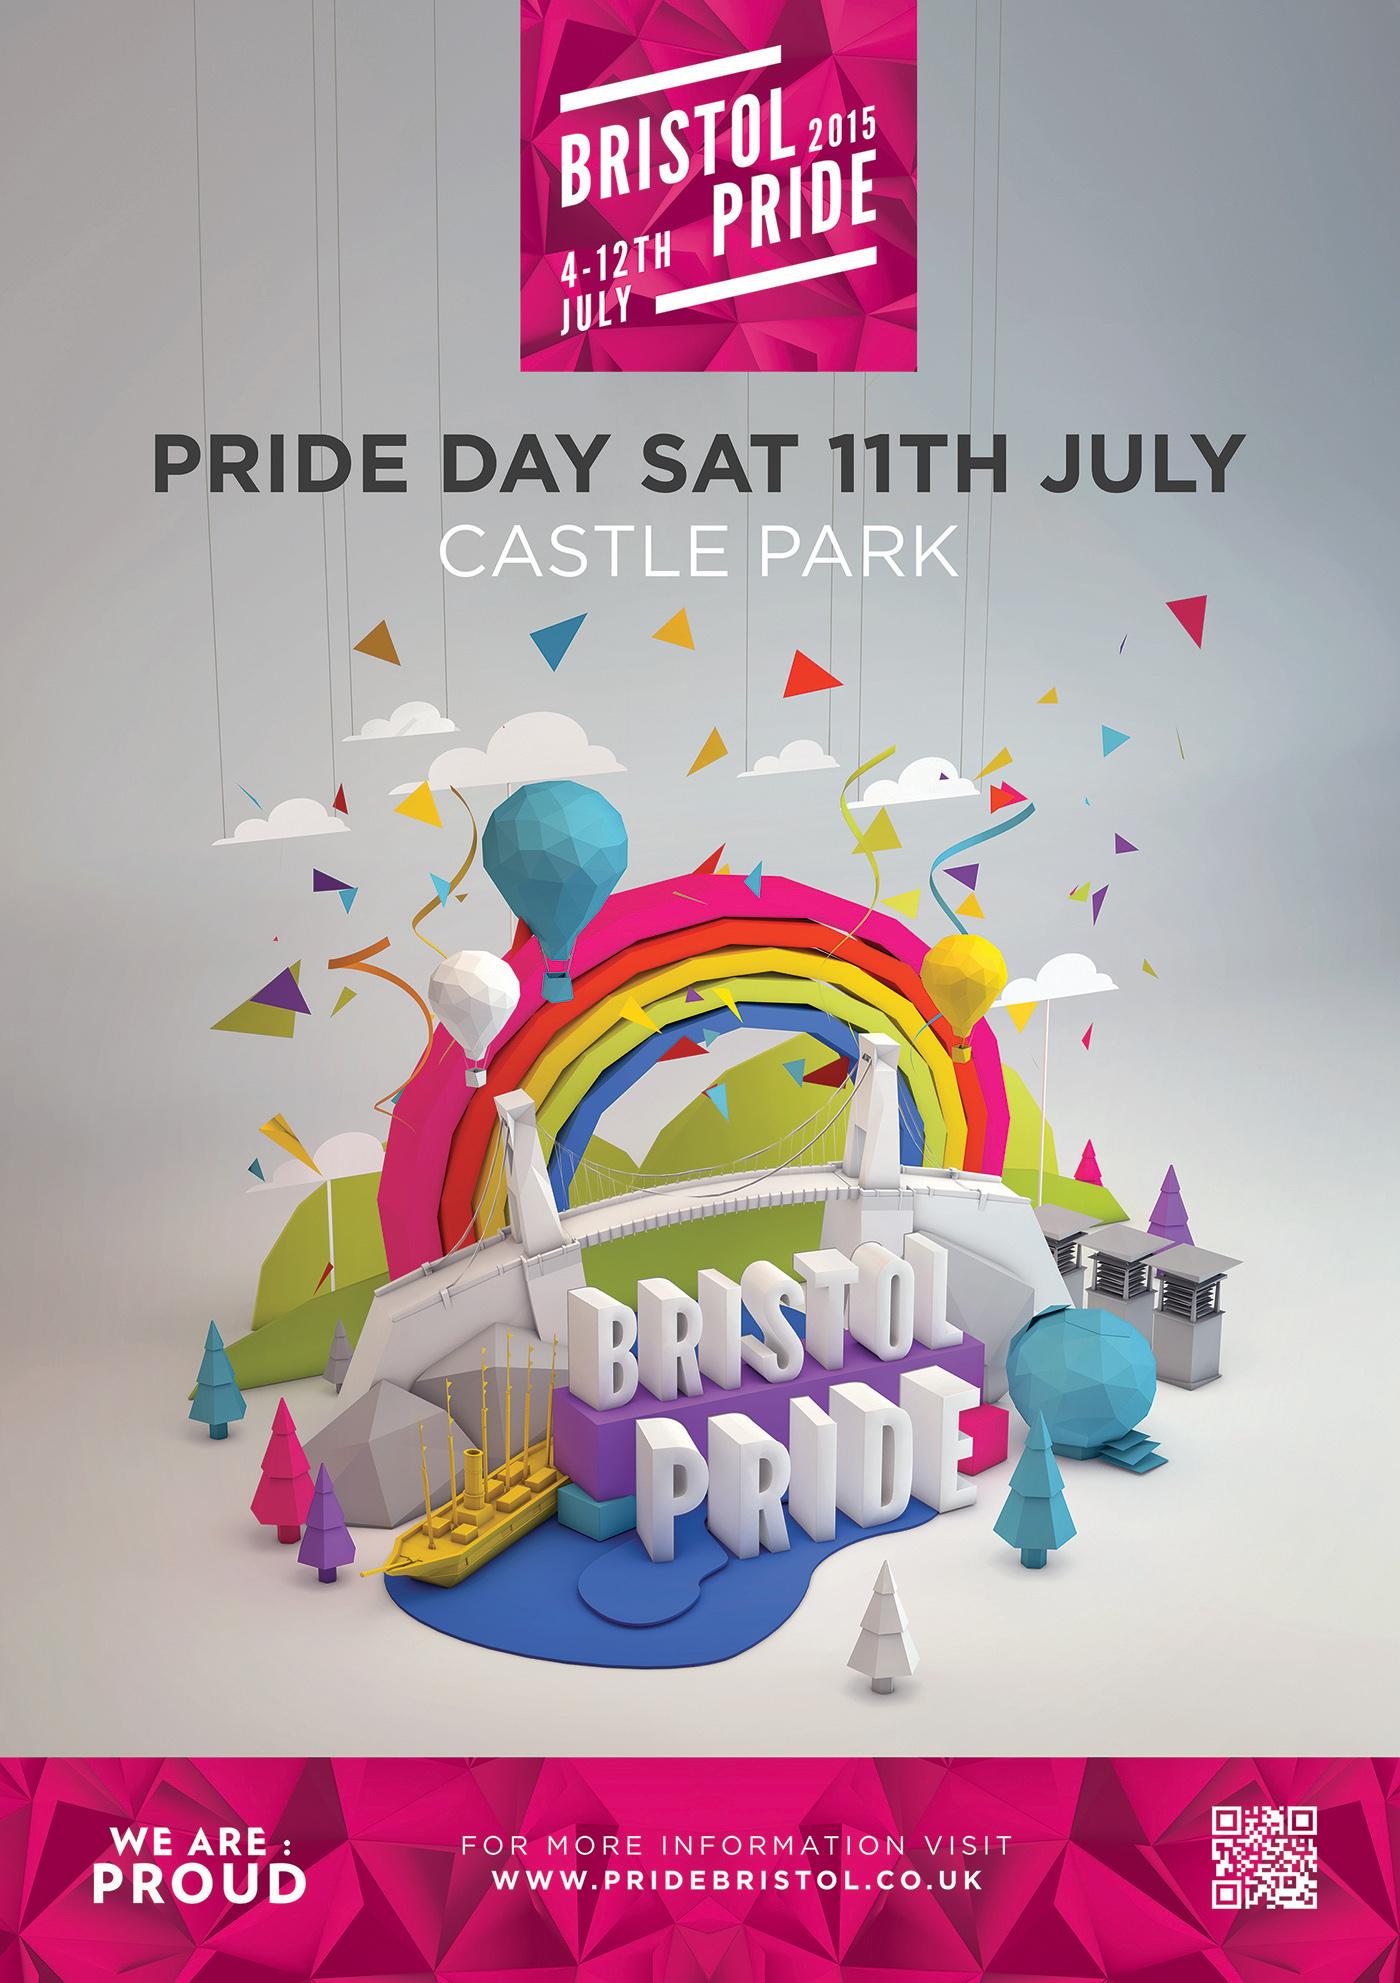 Bristol Pride 2015 Branding